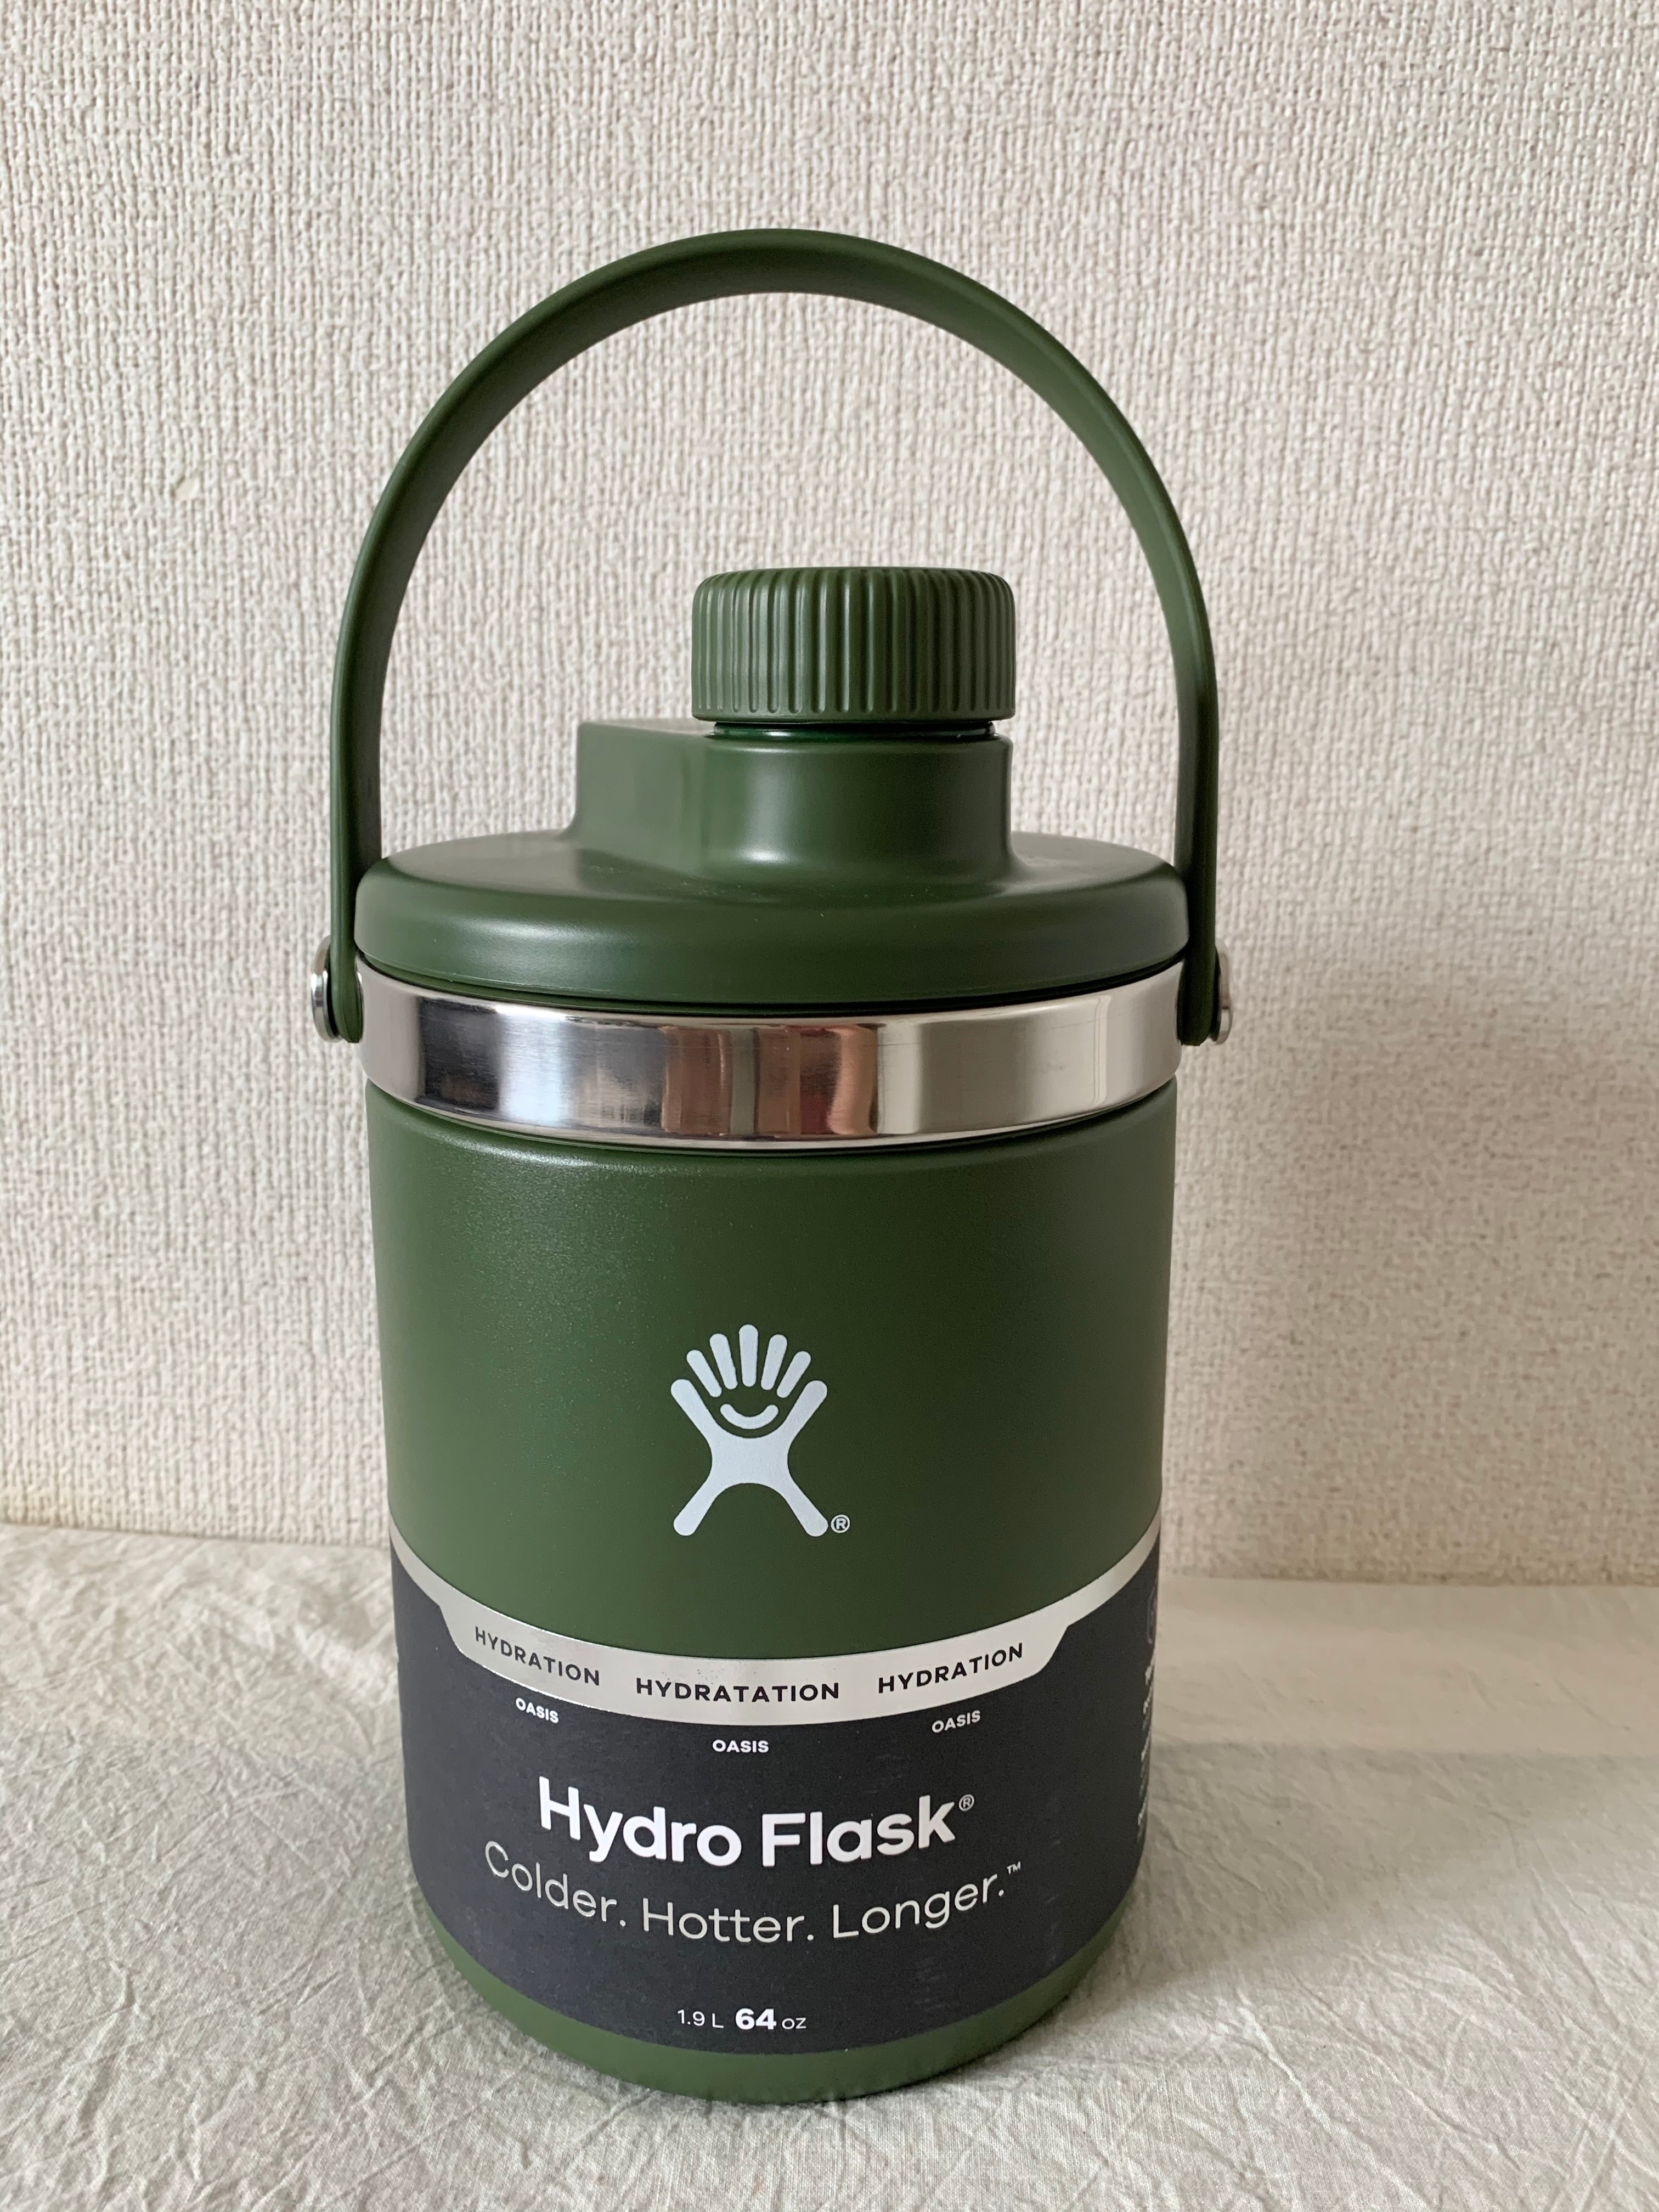 【Hydro Flask】64 oz Oasis / オリーブ